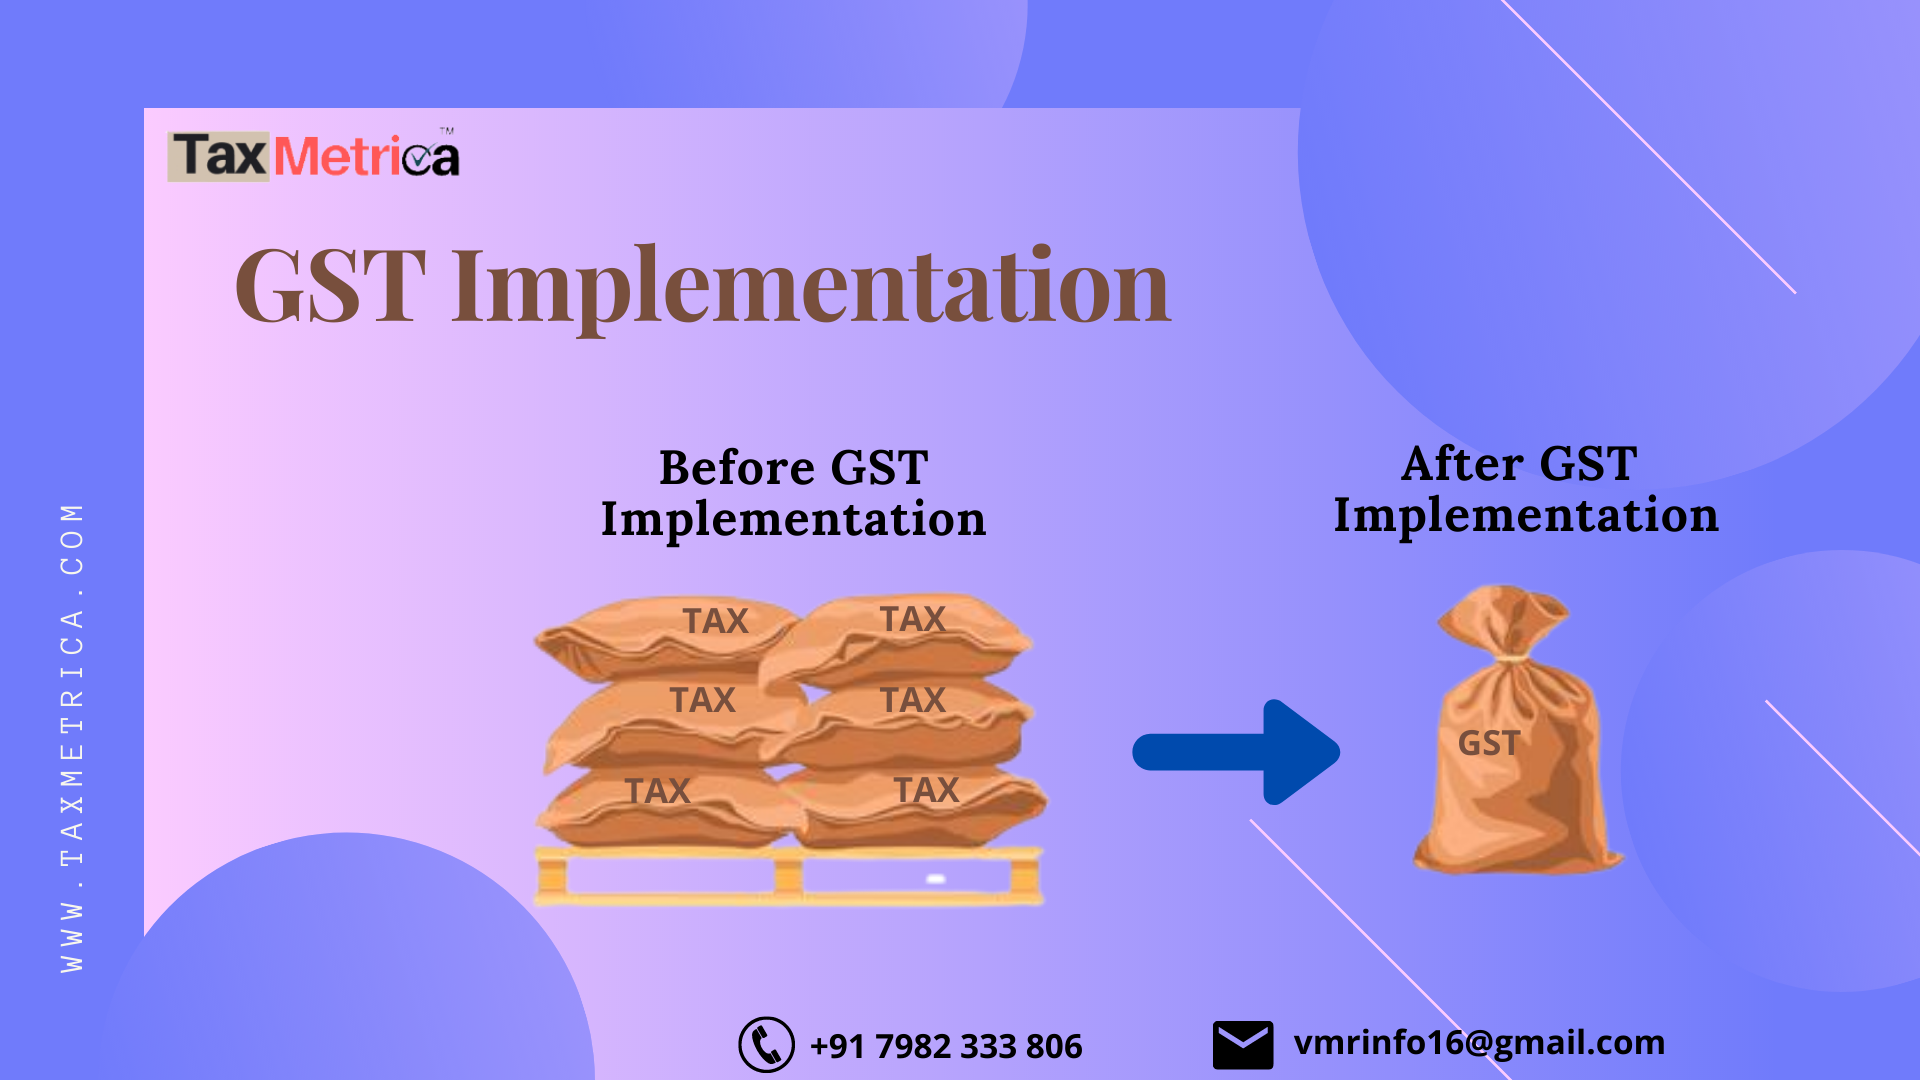 GST Implementation